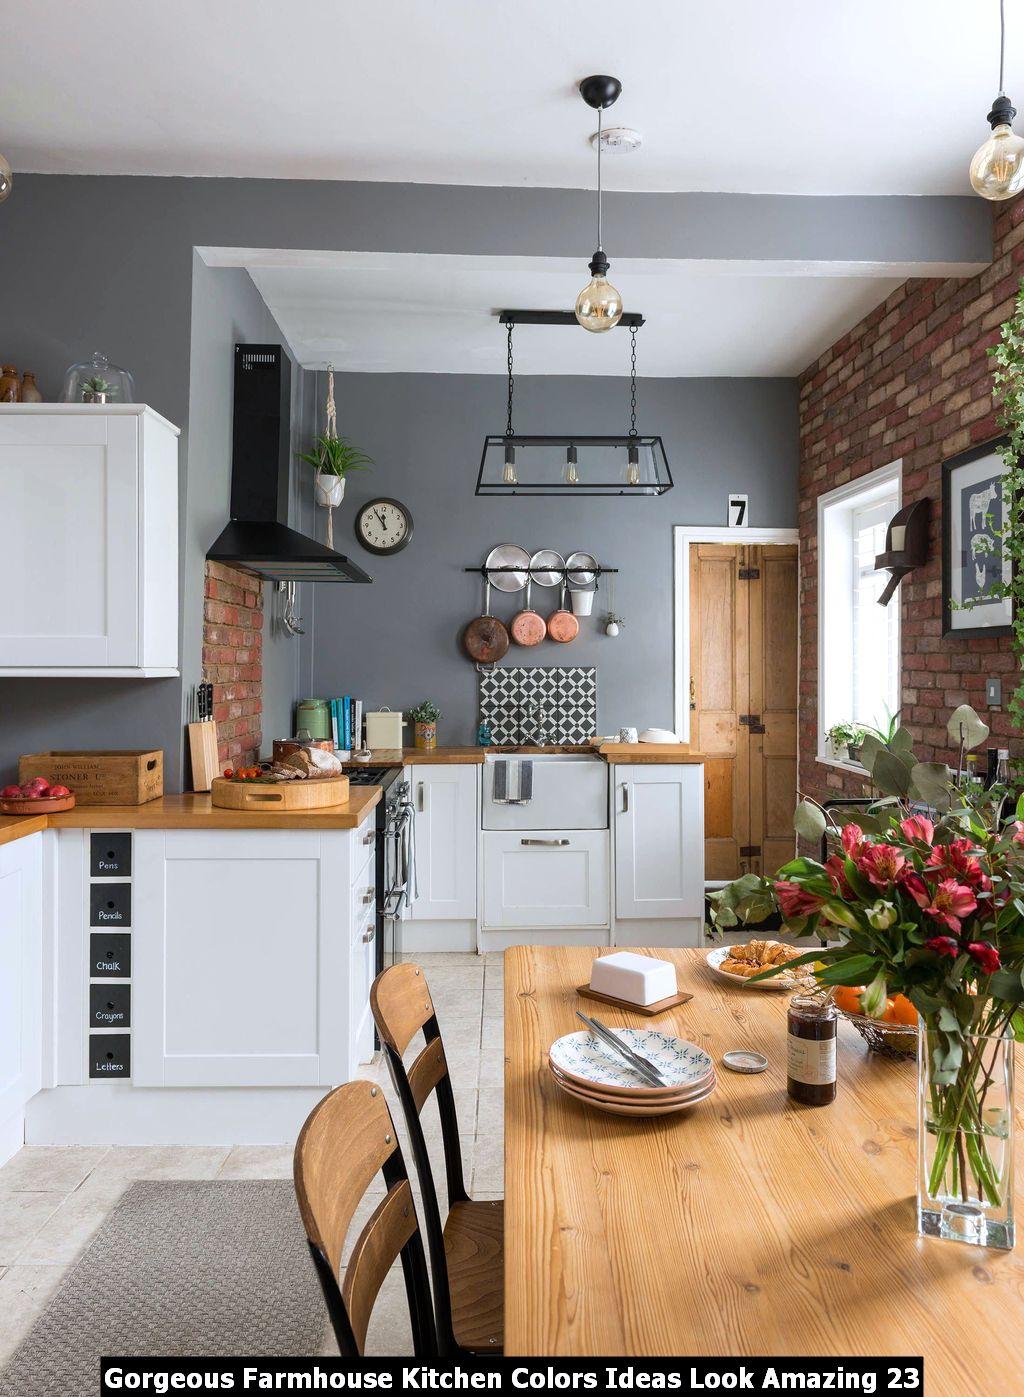 Gorgeous Farmhouse Kitchen Colors Ideas Look Amazing ...